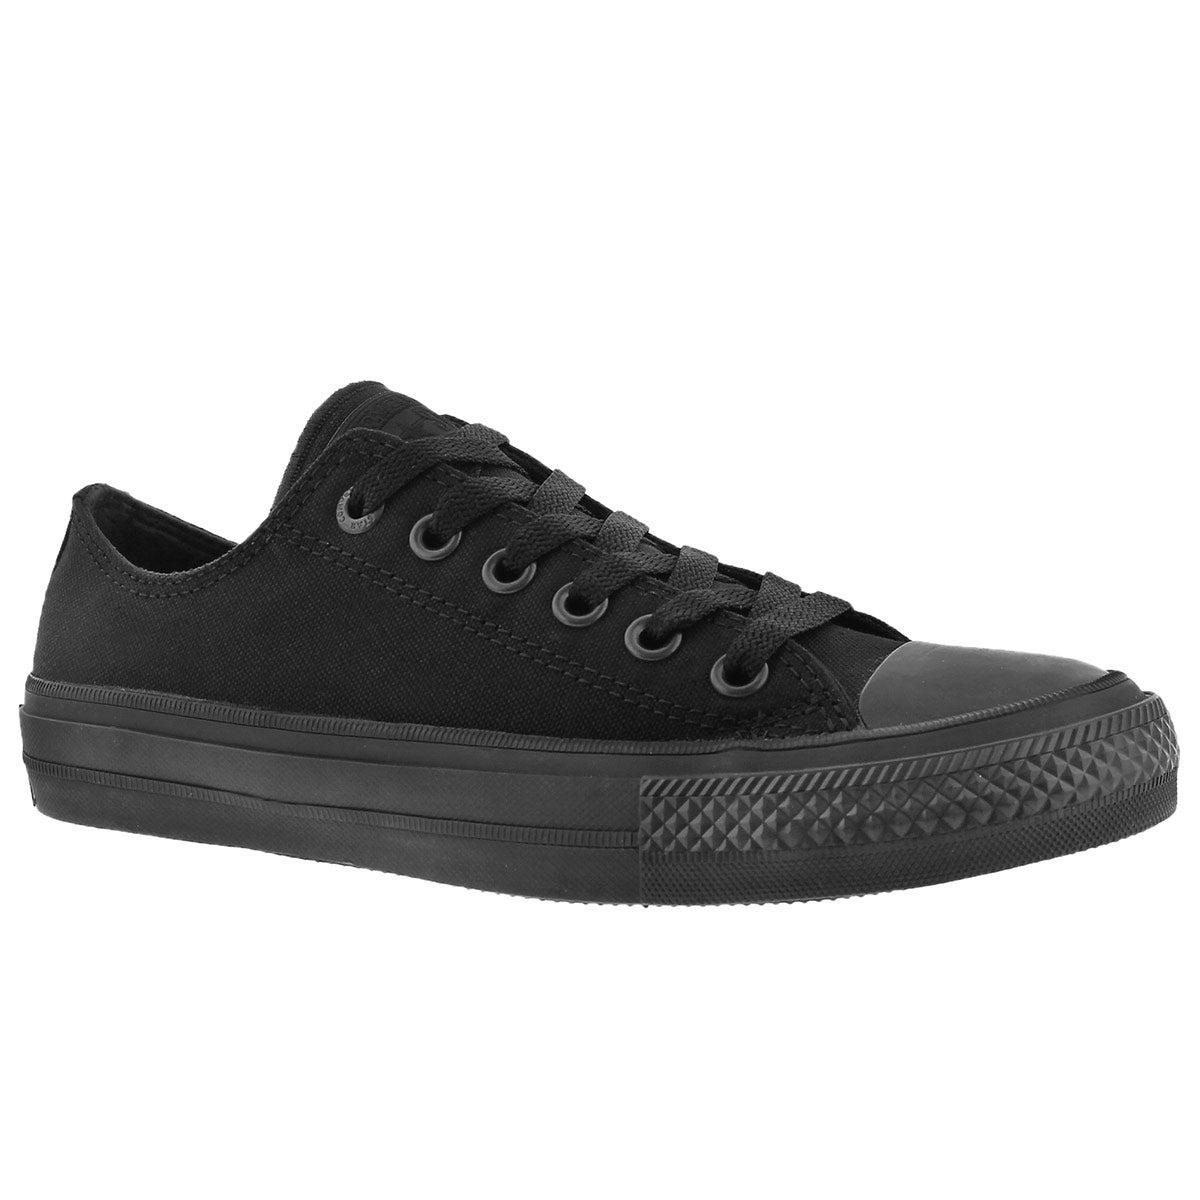 Lds Chuck II Viz Flow blk mono sneaker